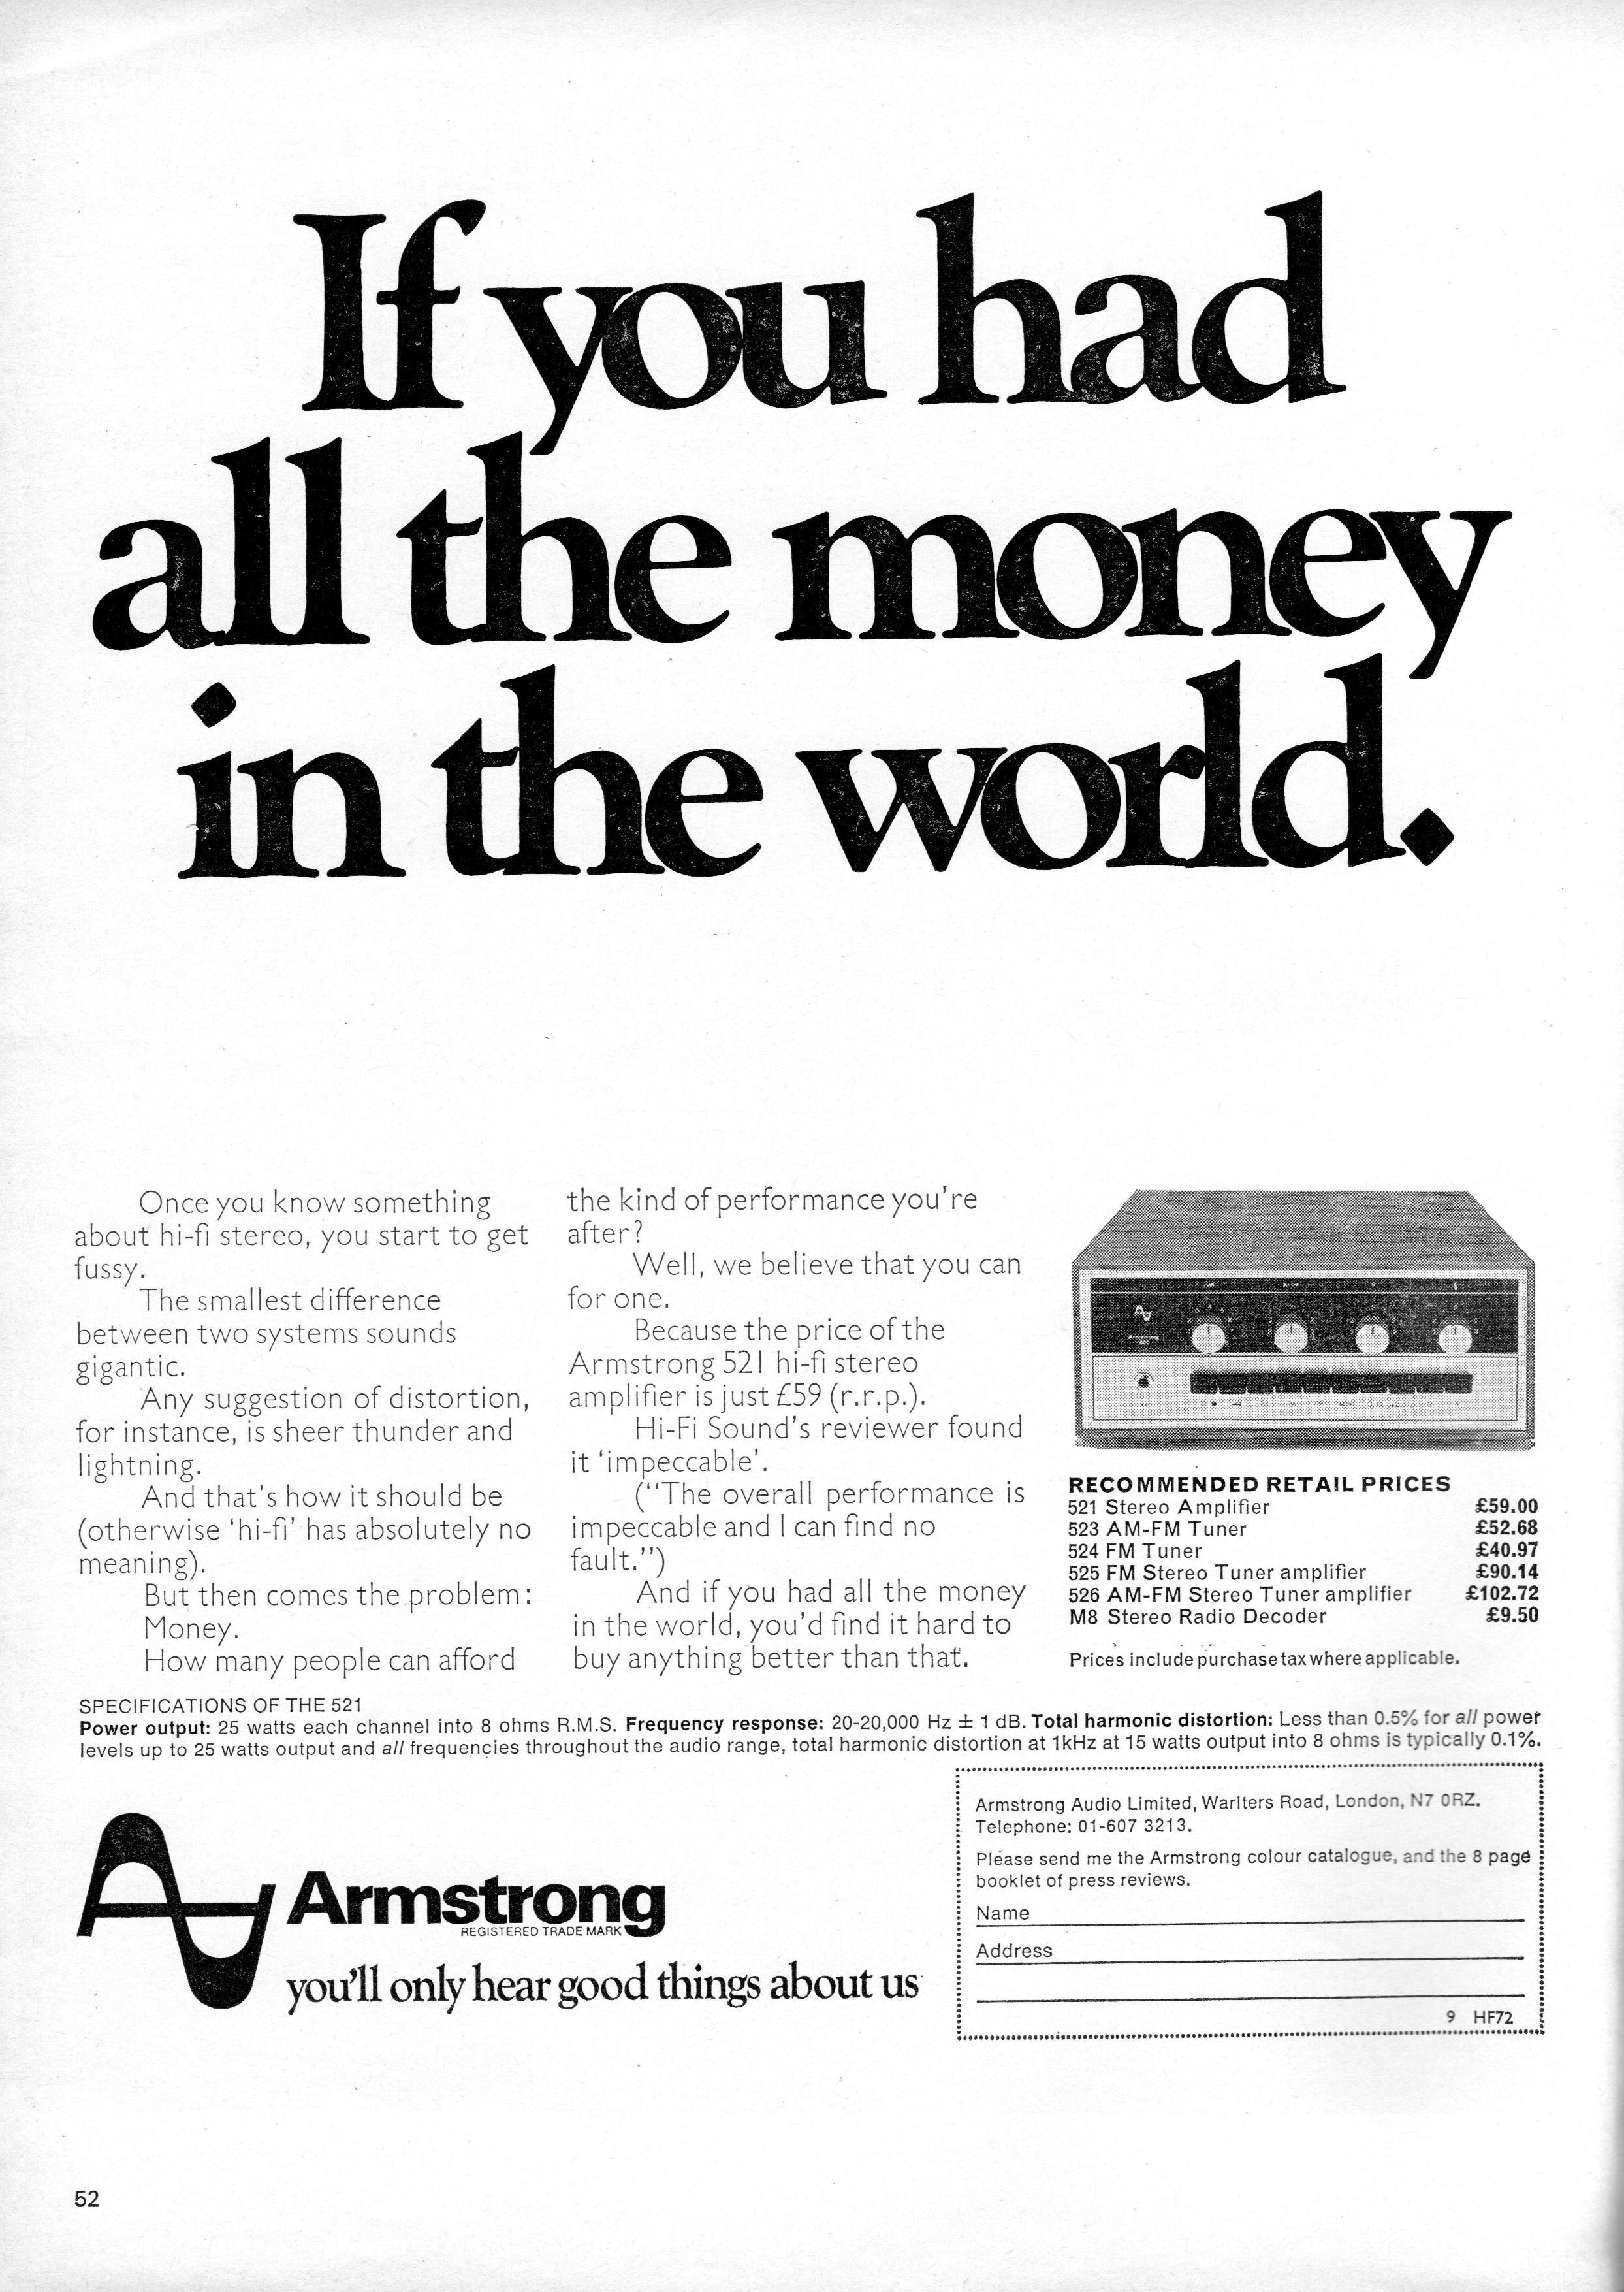 Armstrong Advert 1972.jpg